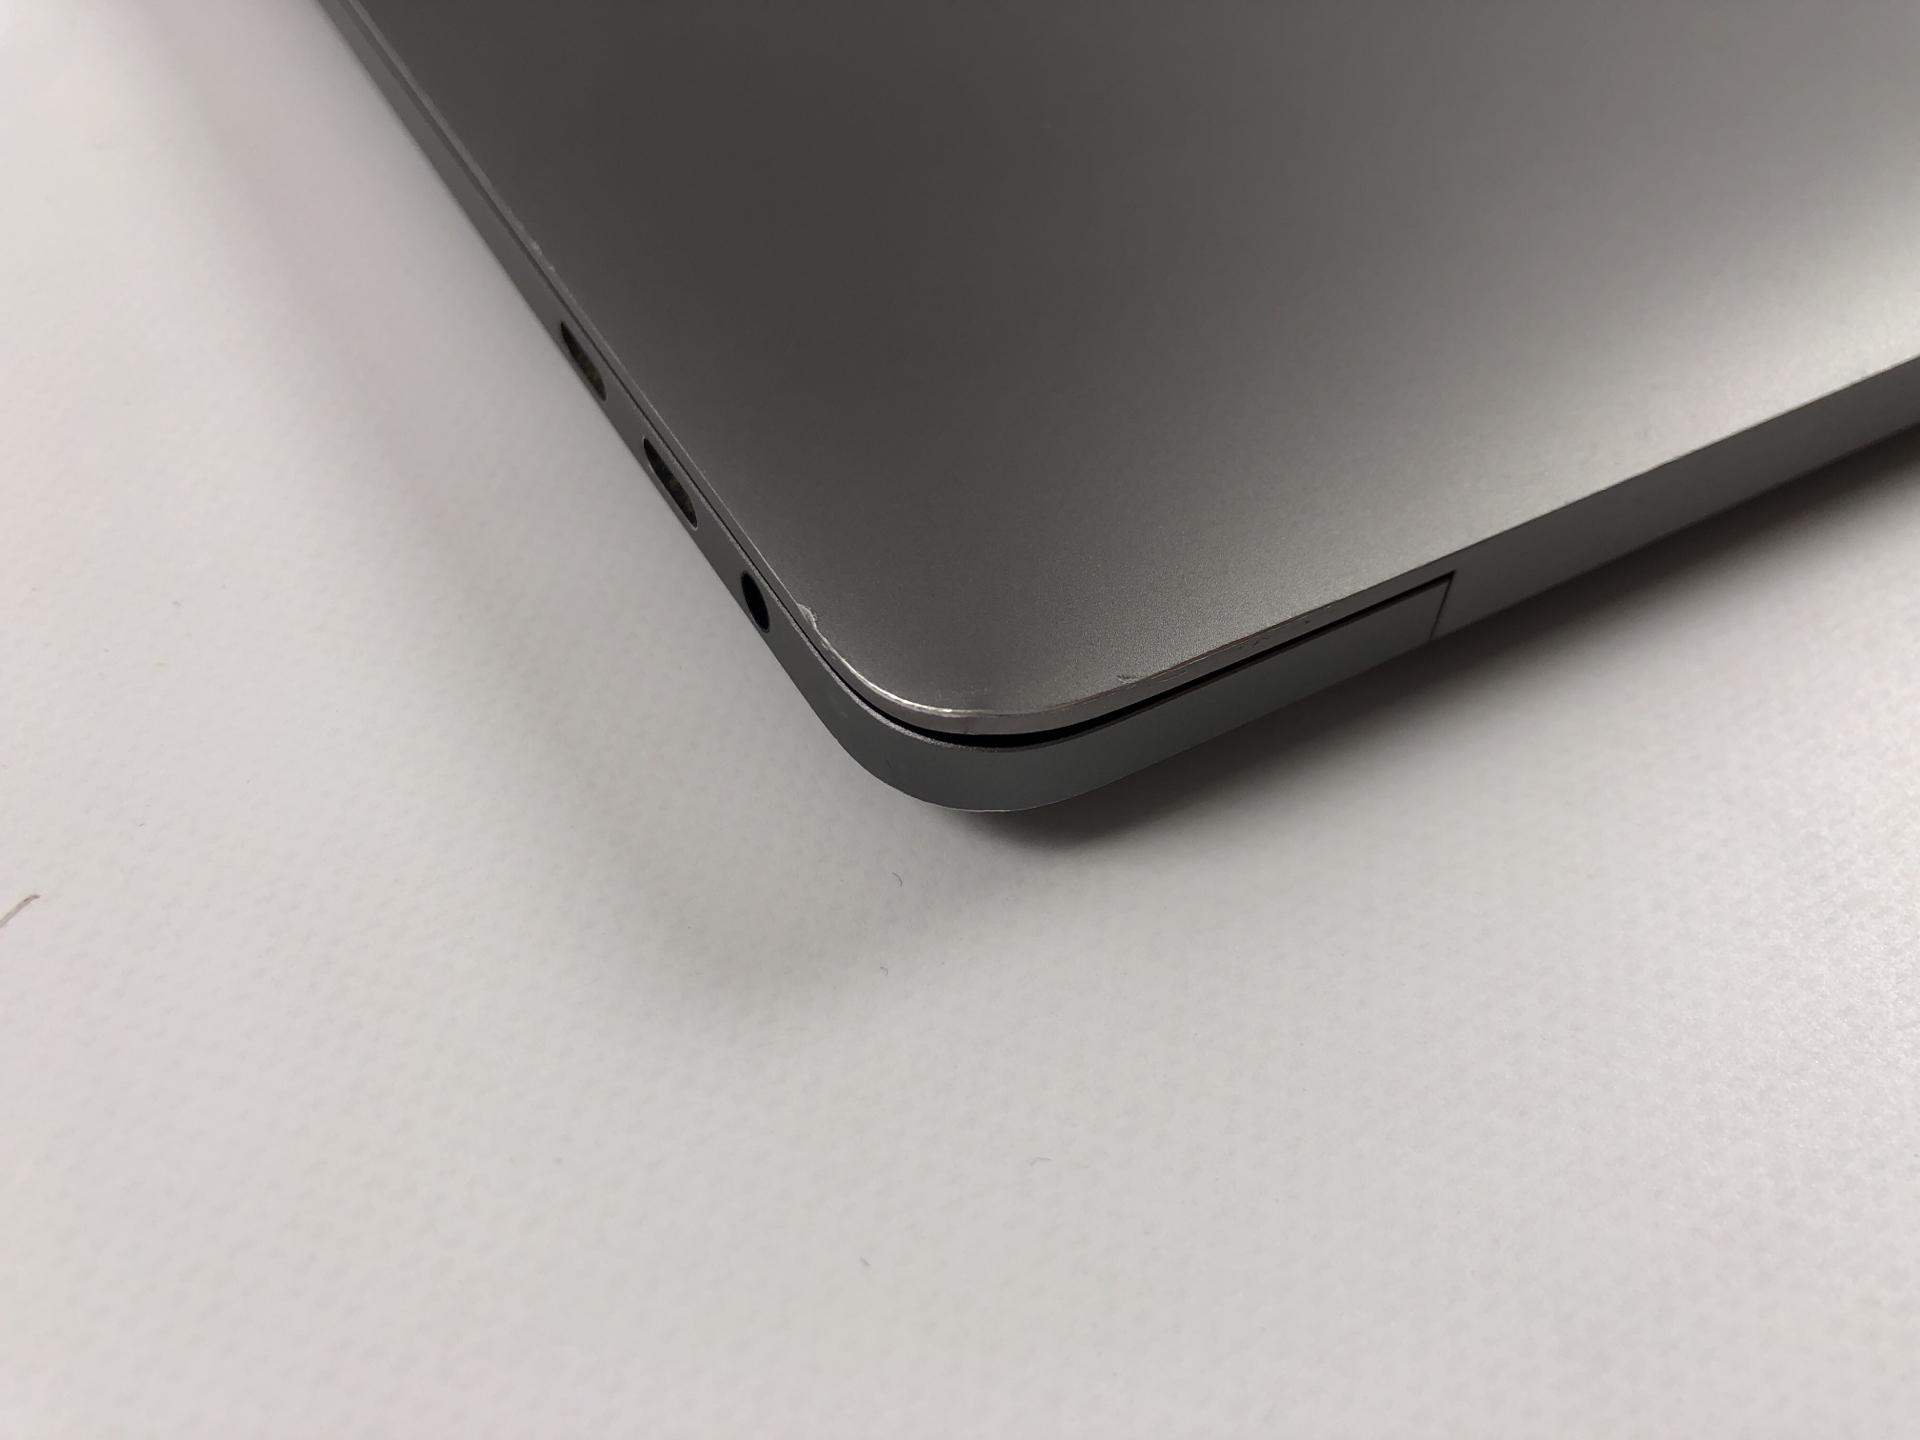 "MacBook Pro 15"" Touch Bar Late 2016 (Intel Quad-Core i7 2.7 GHz 16 GB RAM 512 GB SSD), Space Gray, Intel Quad-Core i7 2.7 GHz, 16 GB RAM, 512 GB SSD, Afbeelding 5"